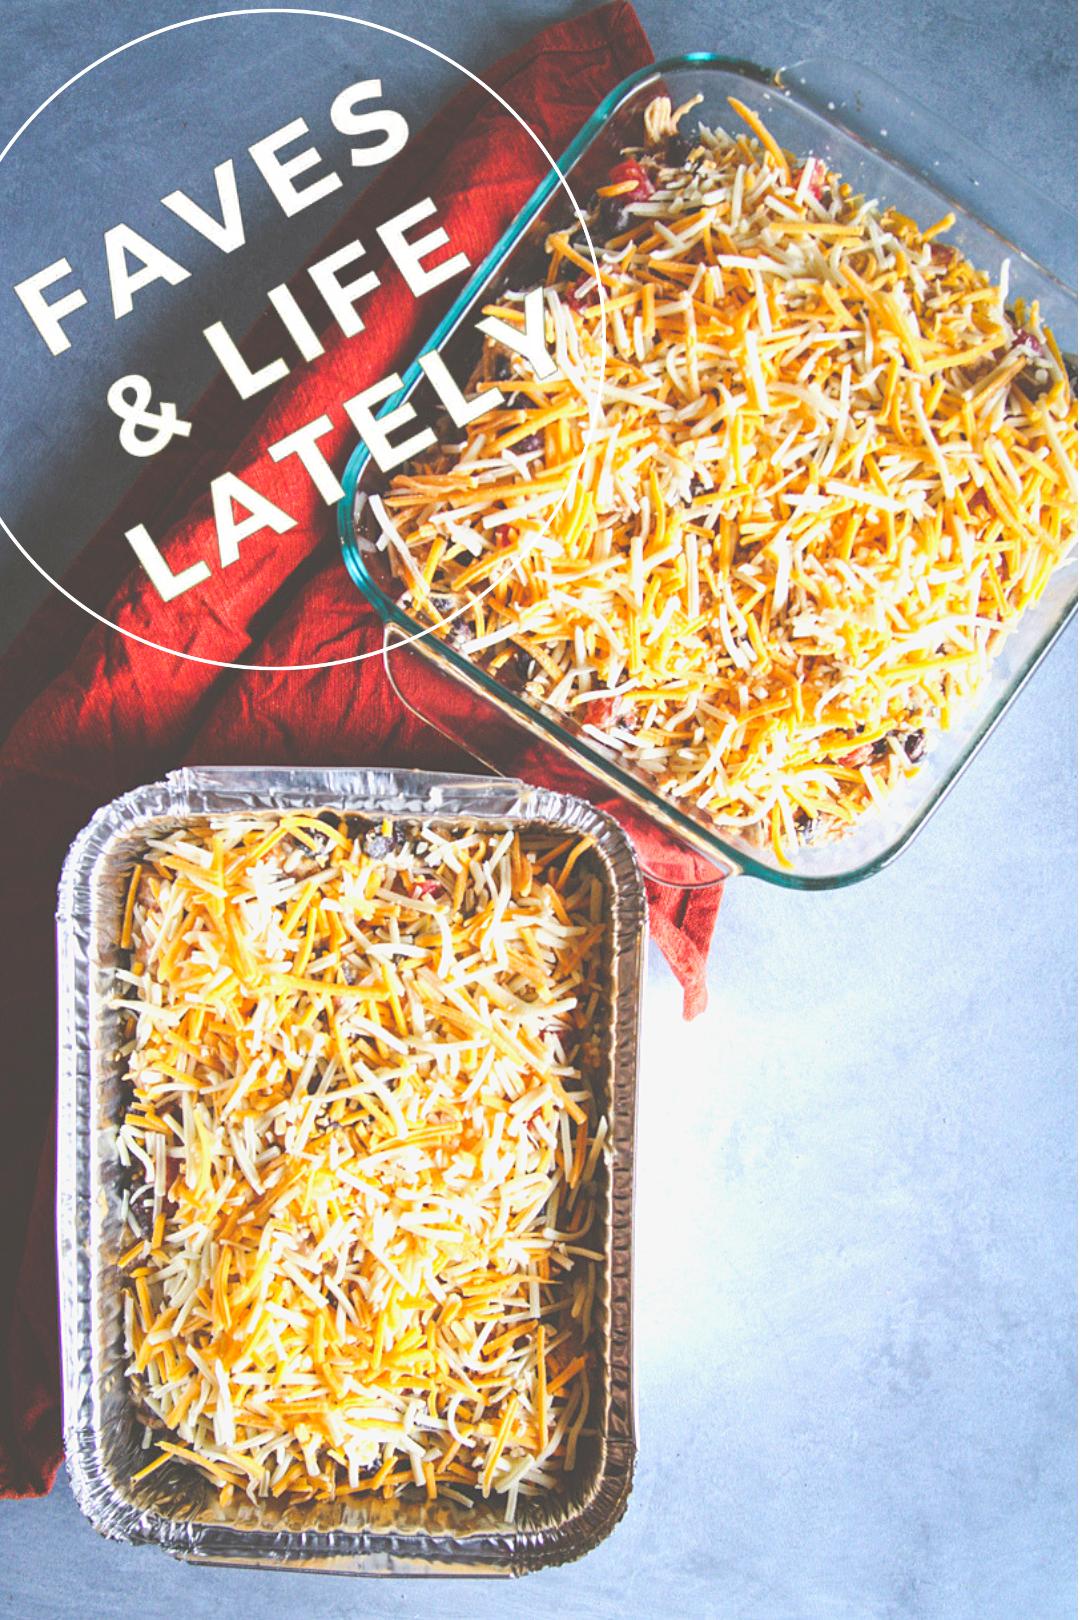 Freezer meal - chicken enchilada casserole casserole, freezer to oven meal, freezer meals for new moms, freezer meals to bring friends in need